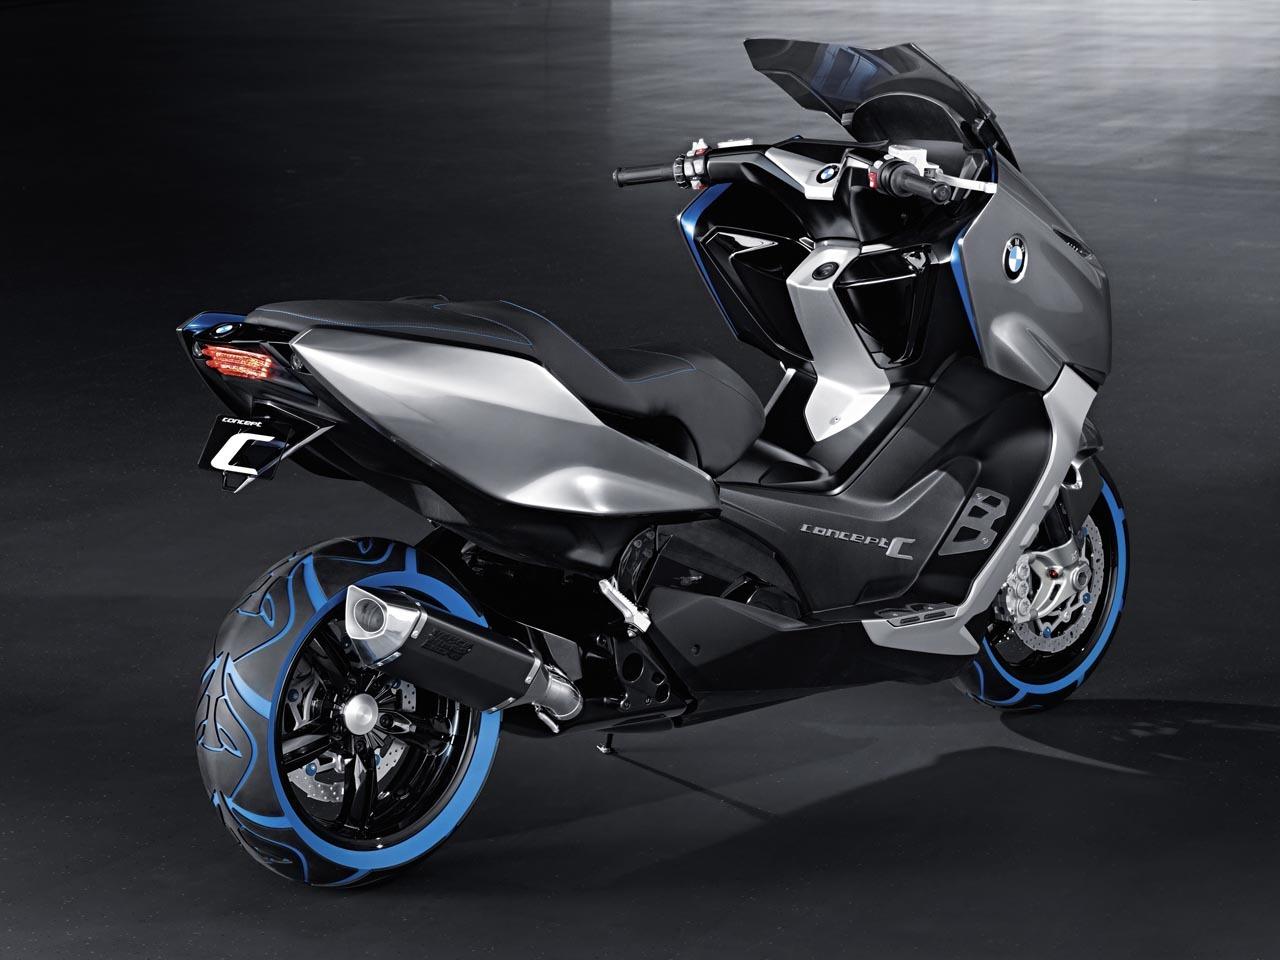 Foto de BMW Concept C Scooter, el Scooter del futuro según BMW (7/19)